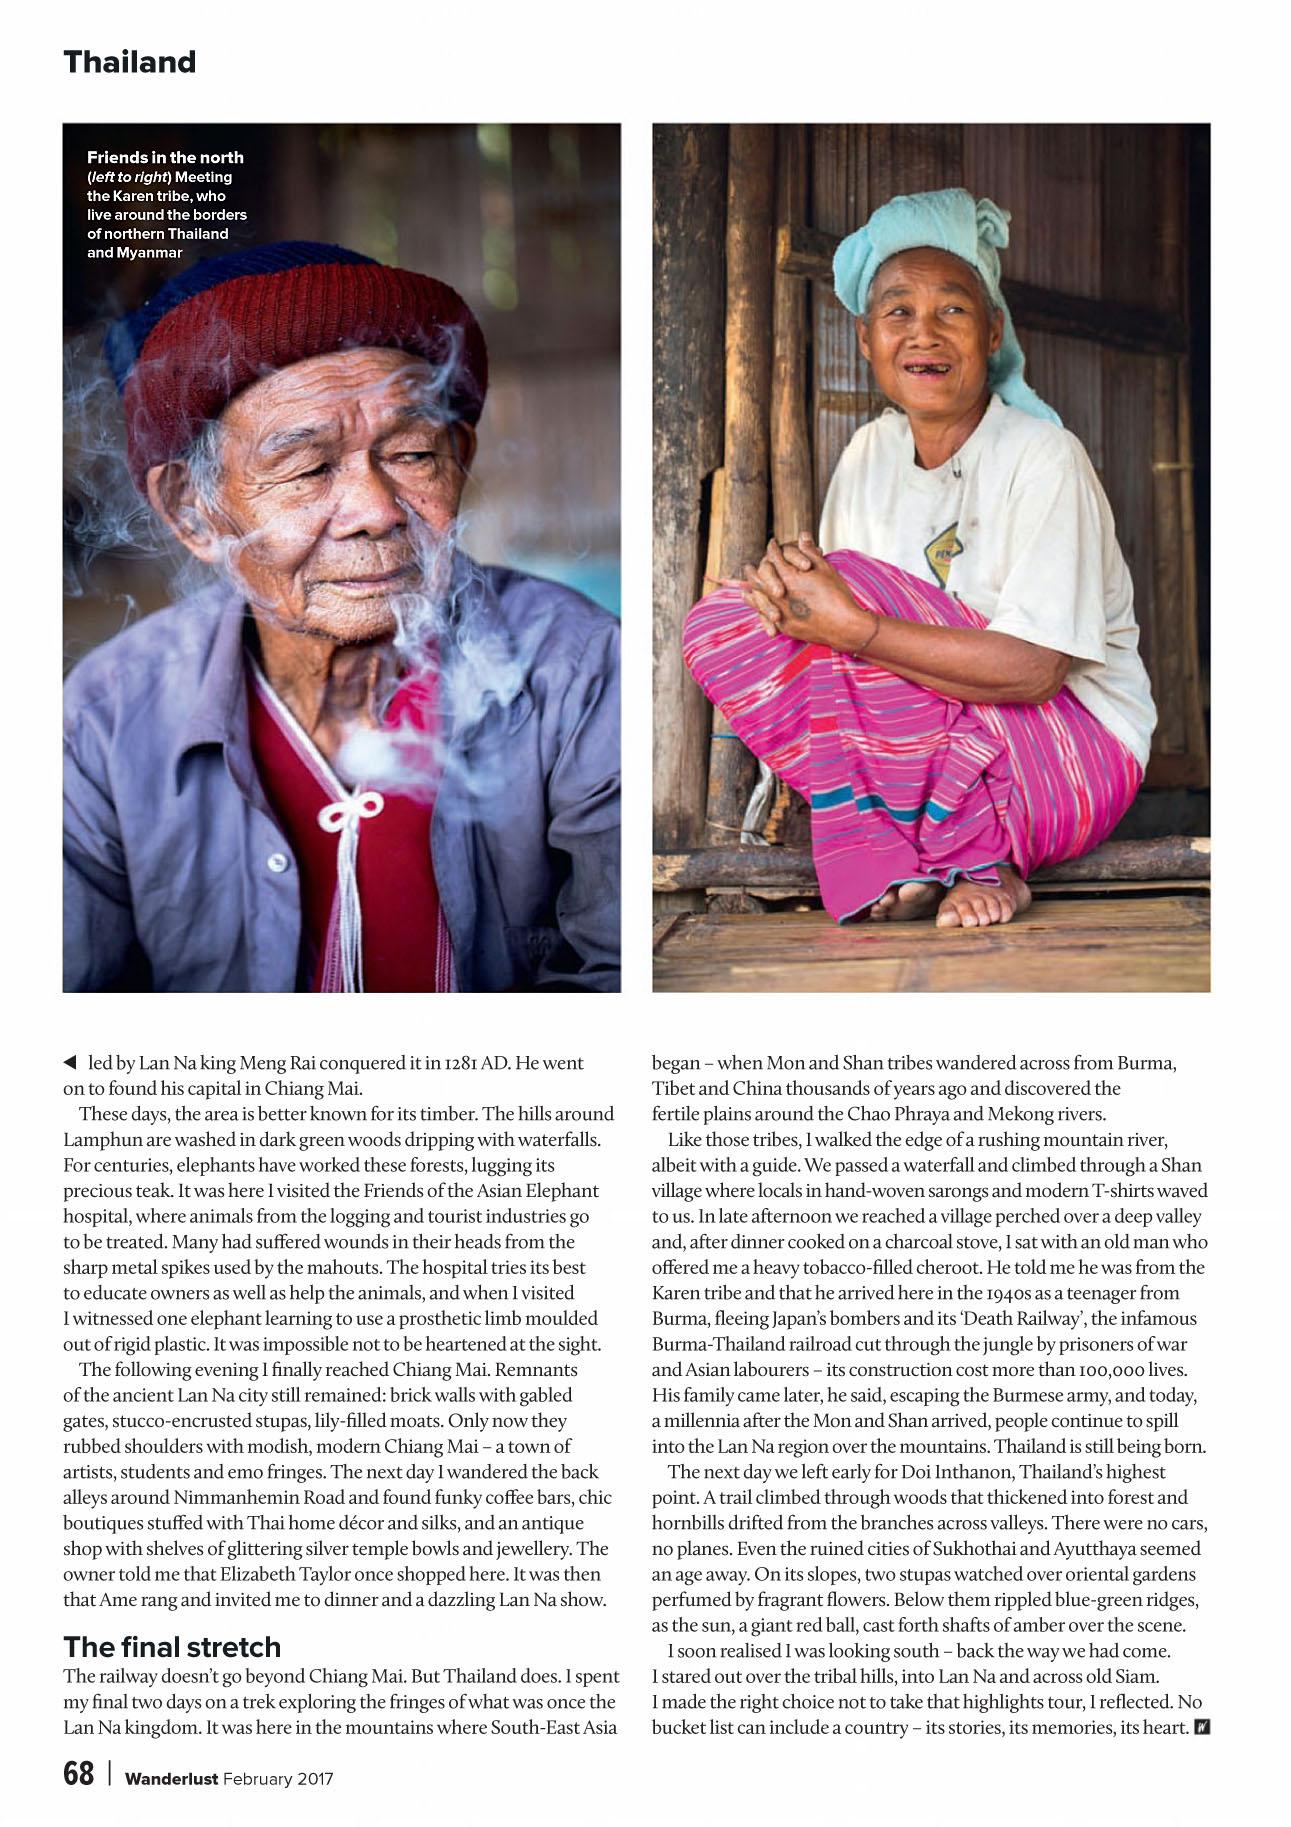 Wanderlust 1702 Thai 09.jpg